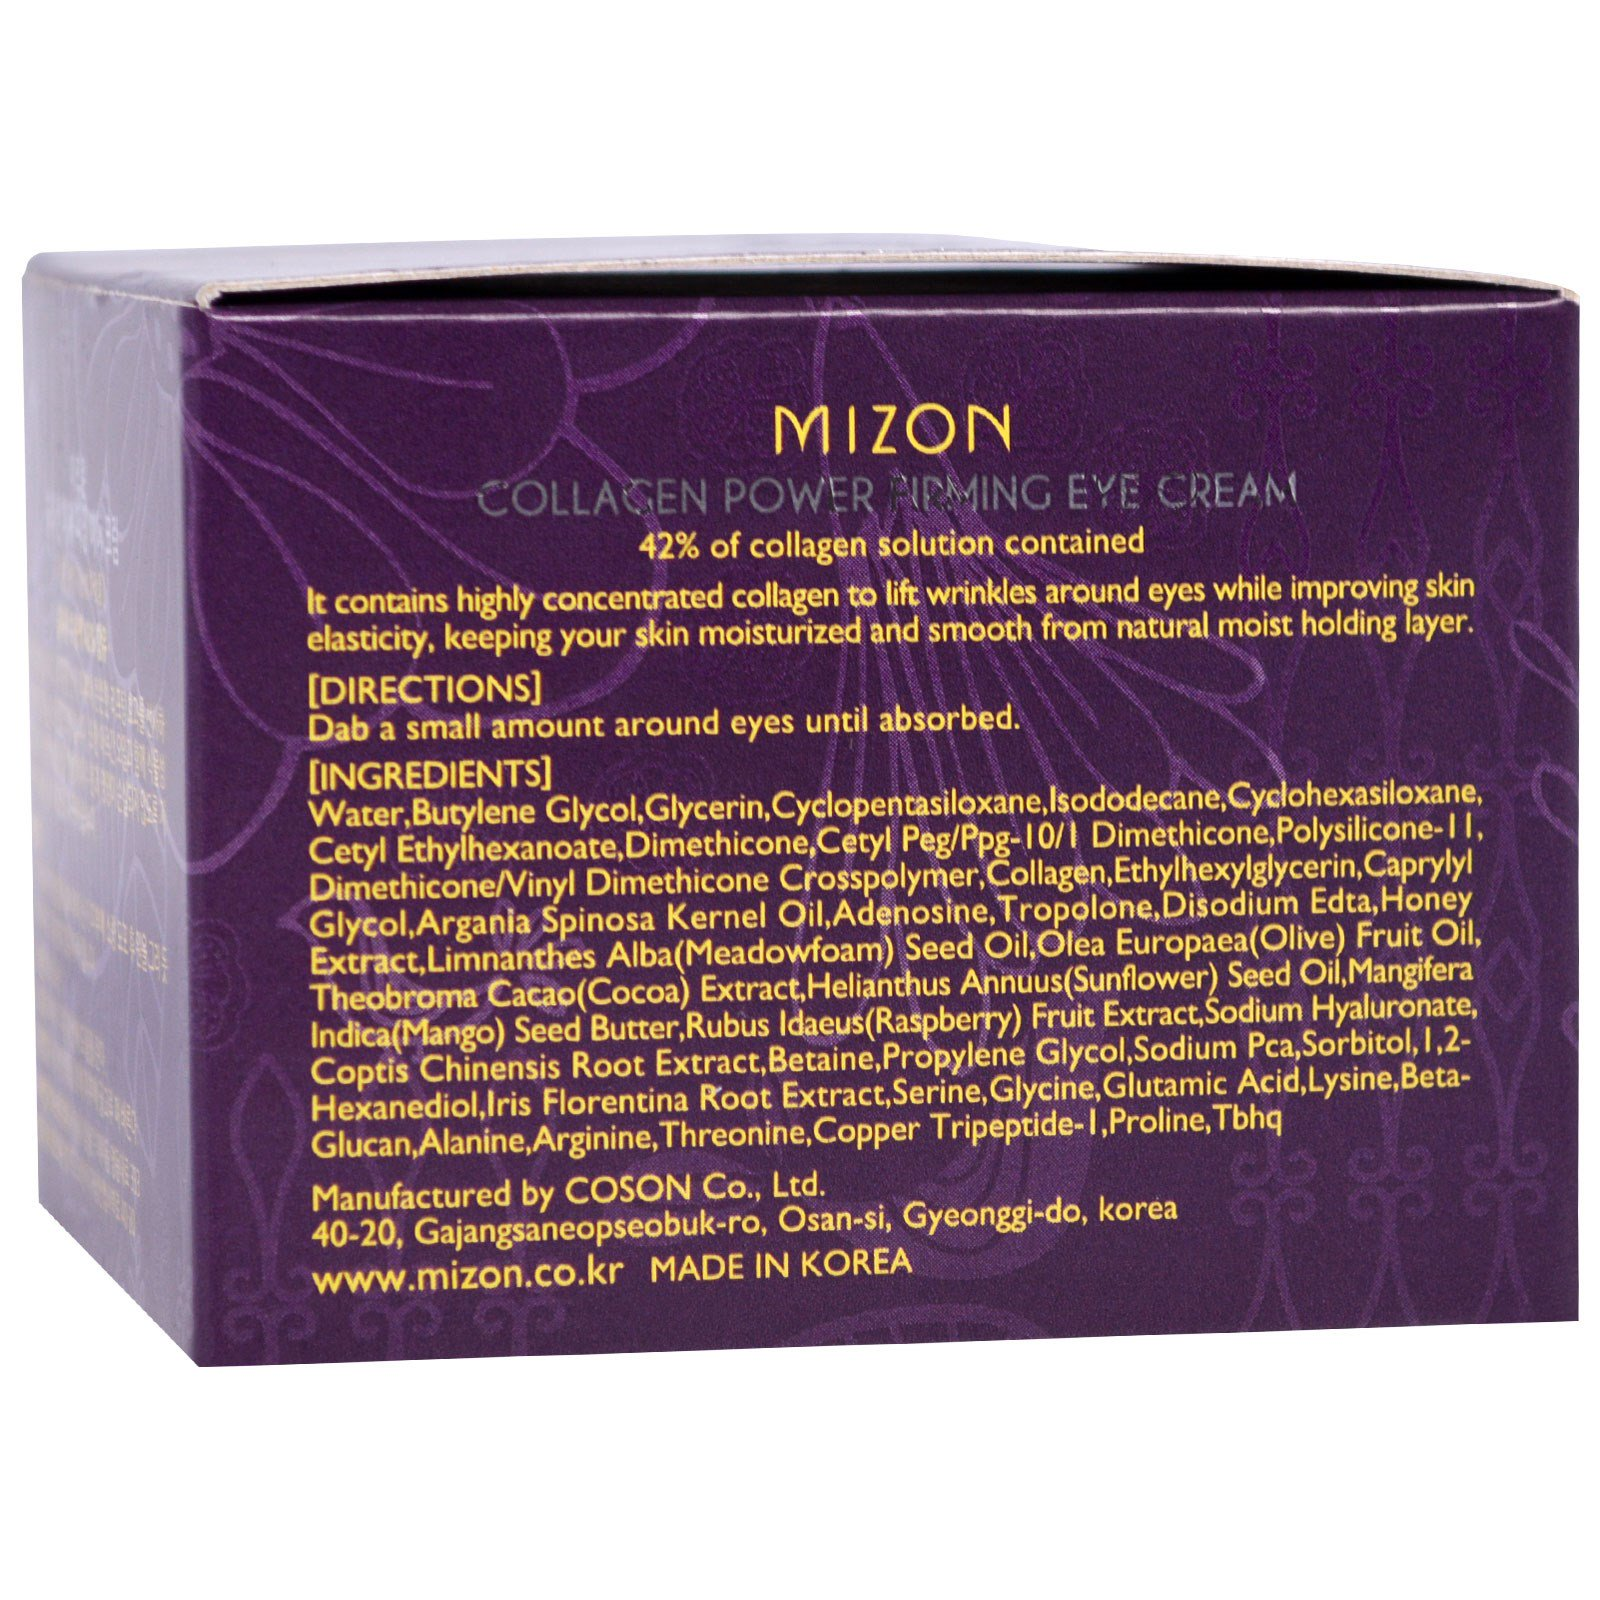 Mizon, Collagen Power Firming Eye Cream, 0.84 oz(pack of 6) The BEST 24 K Gold Facial Mask 8.8 oz - Gold Mask for Anti Wrinkle Anti Aging Facial Treatment, Pore Minimizer, Acne Scar Treatment & Blackhead Remover